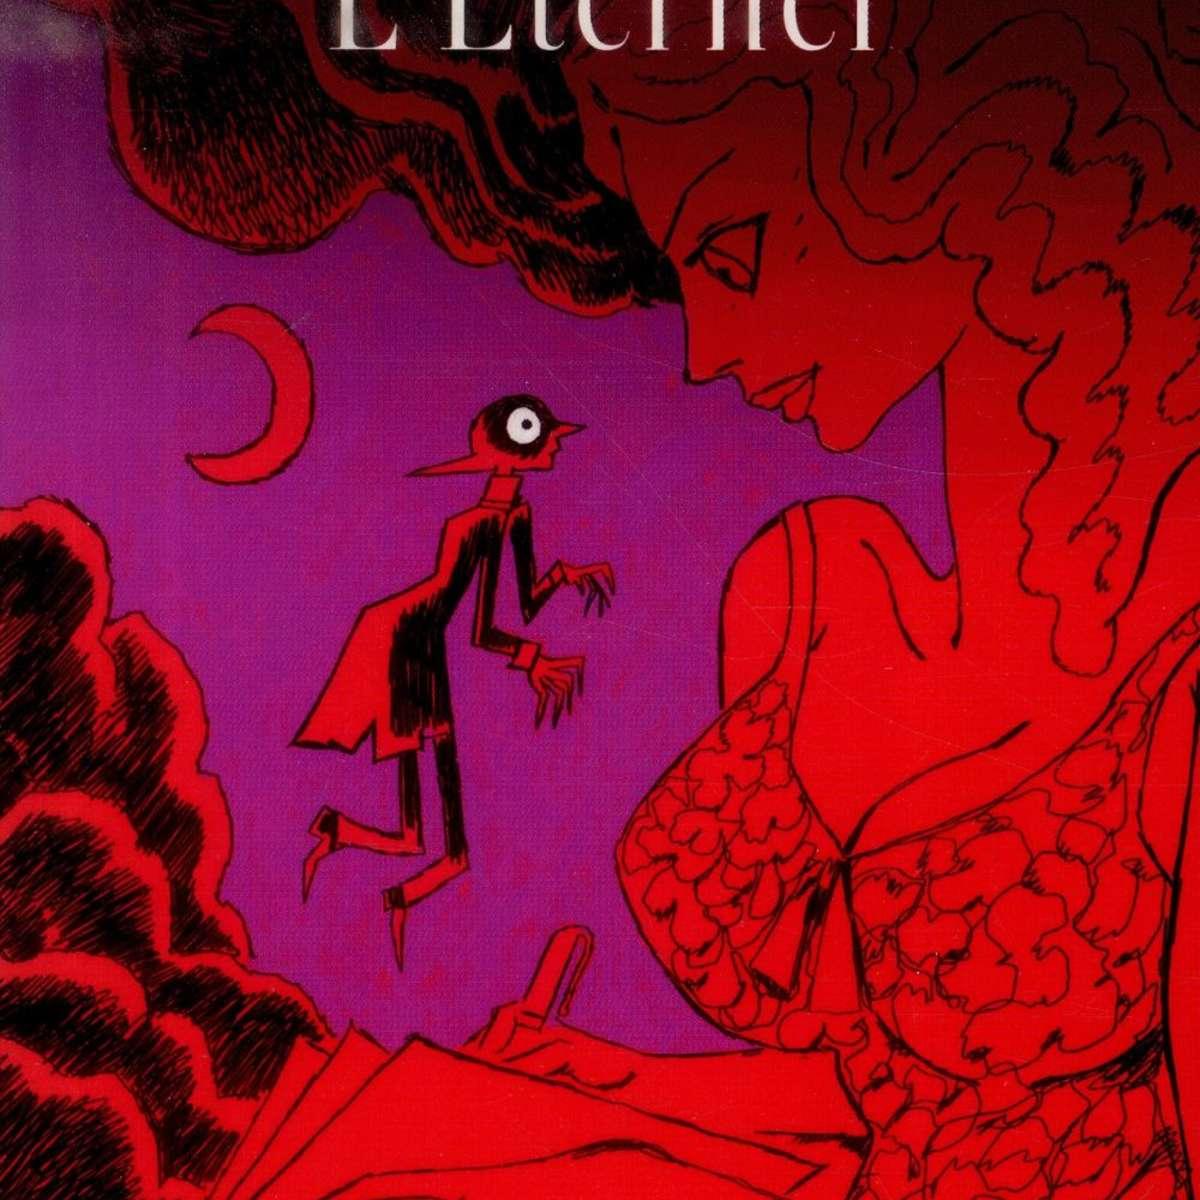 Leternel-book-cover.jpg